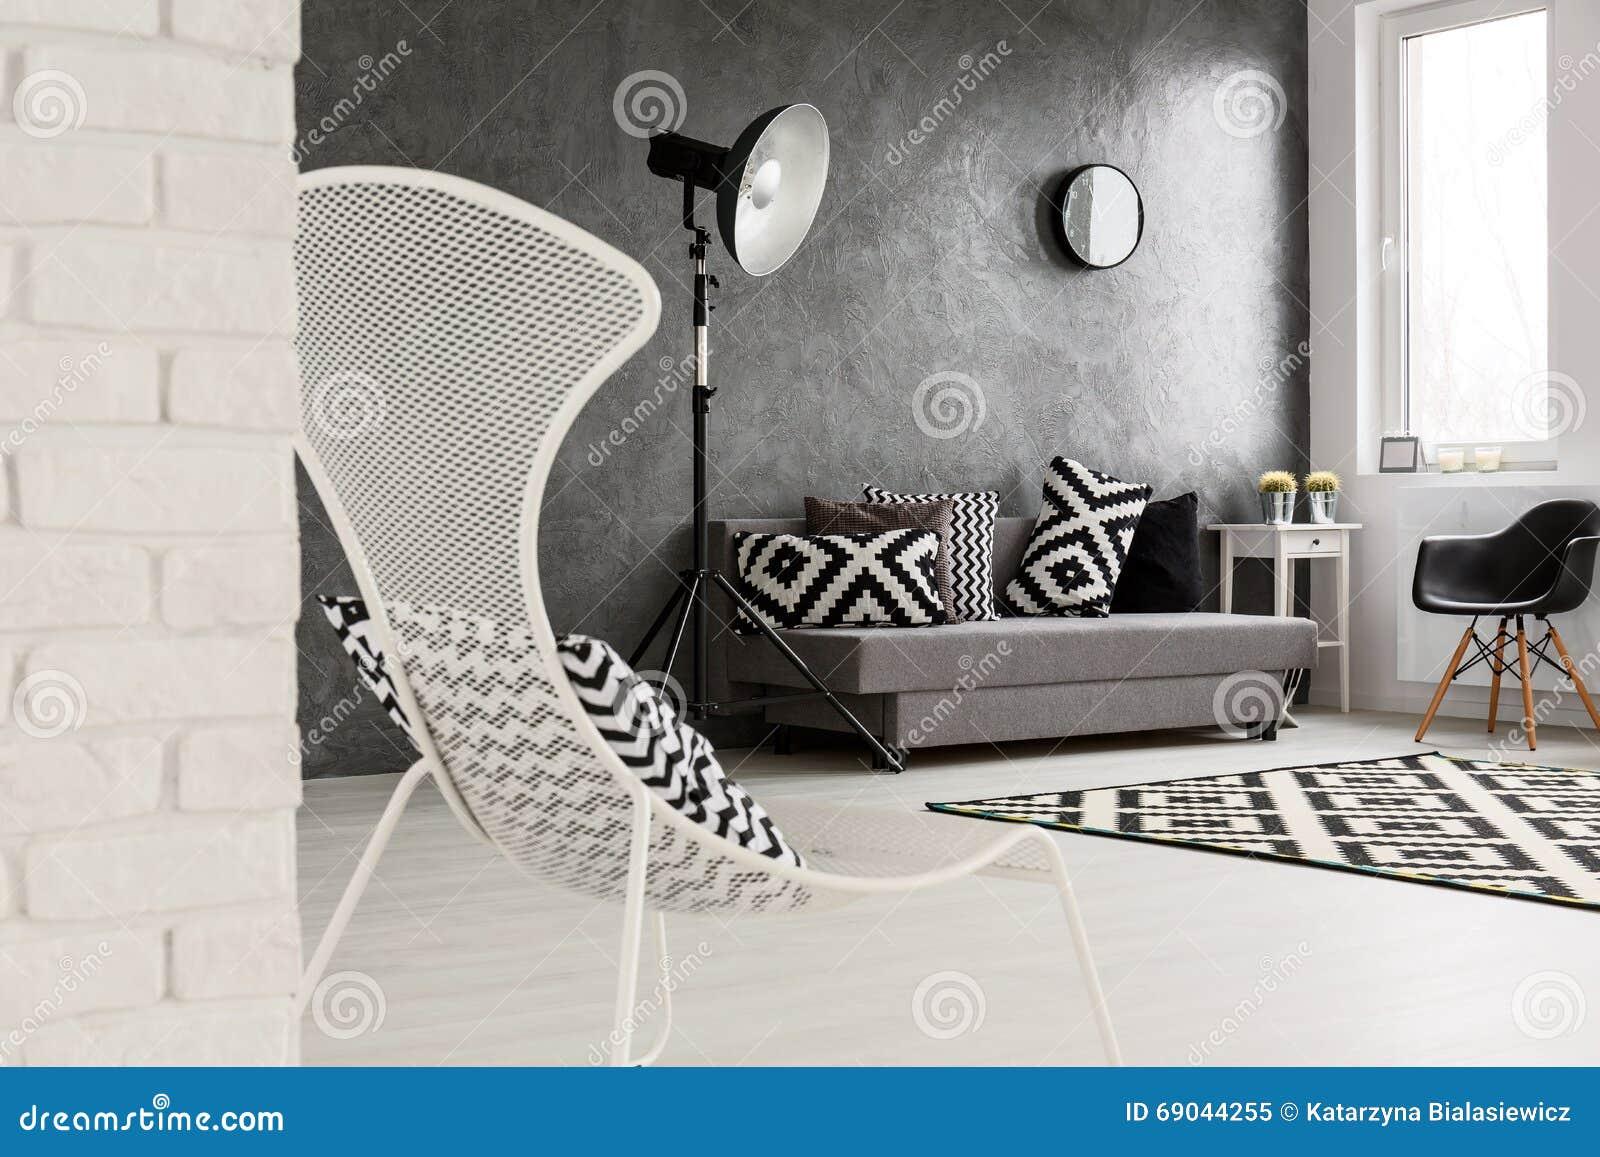 Brick Lamp Living Room